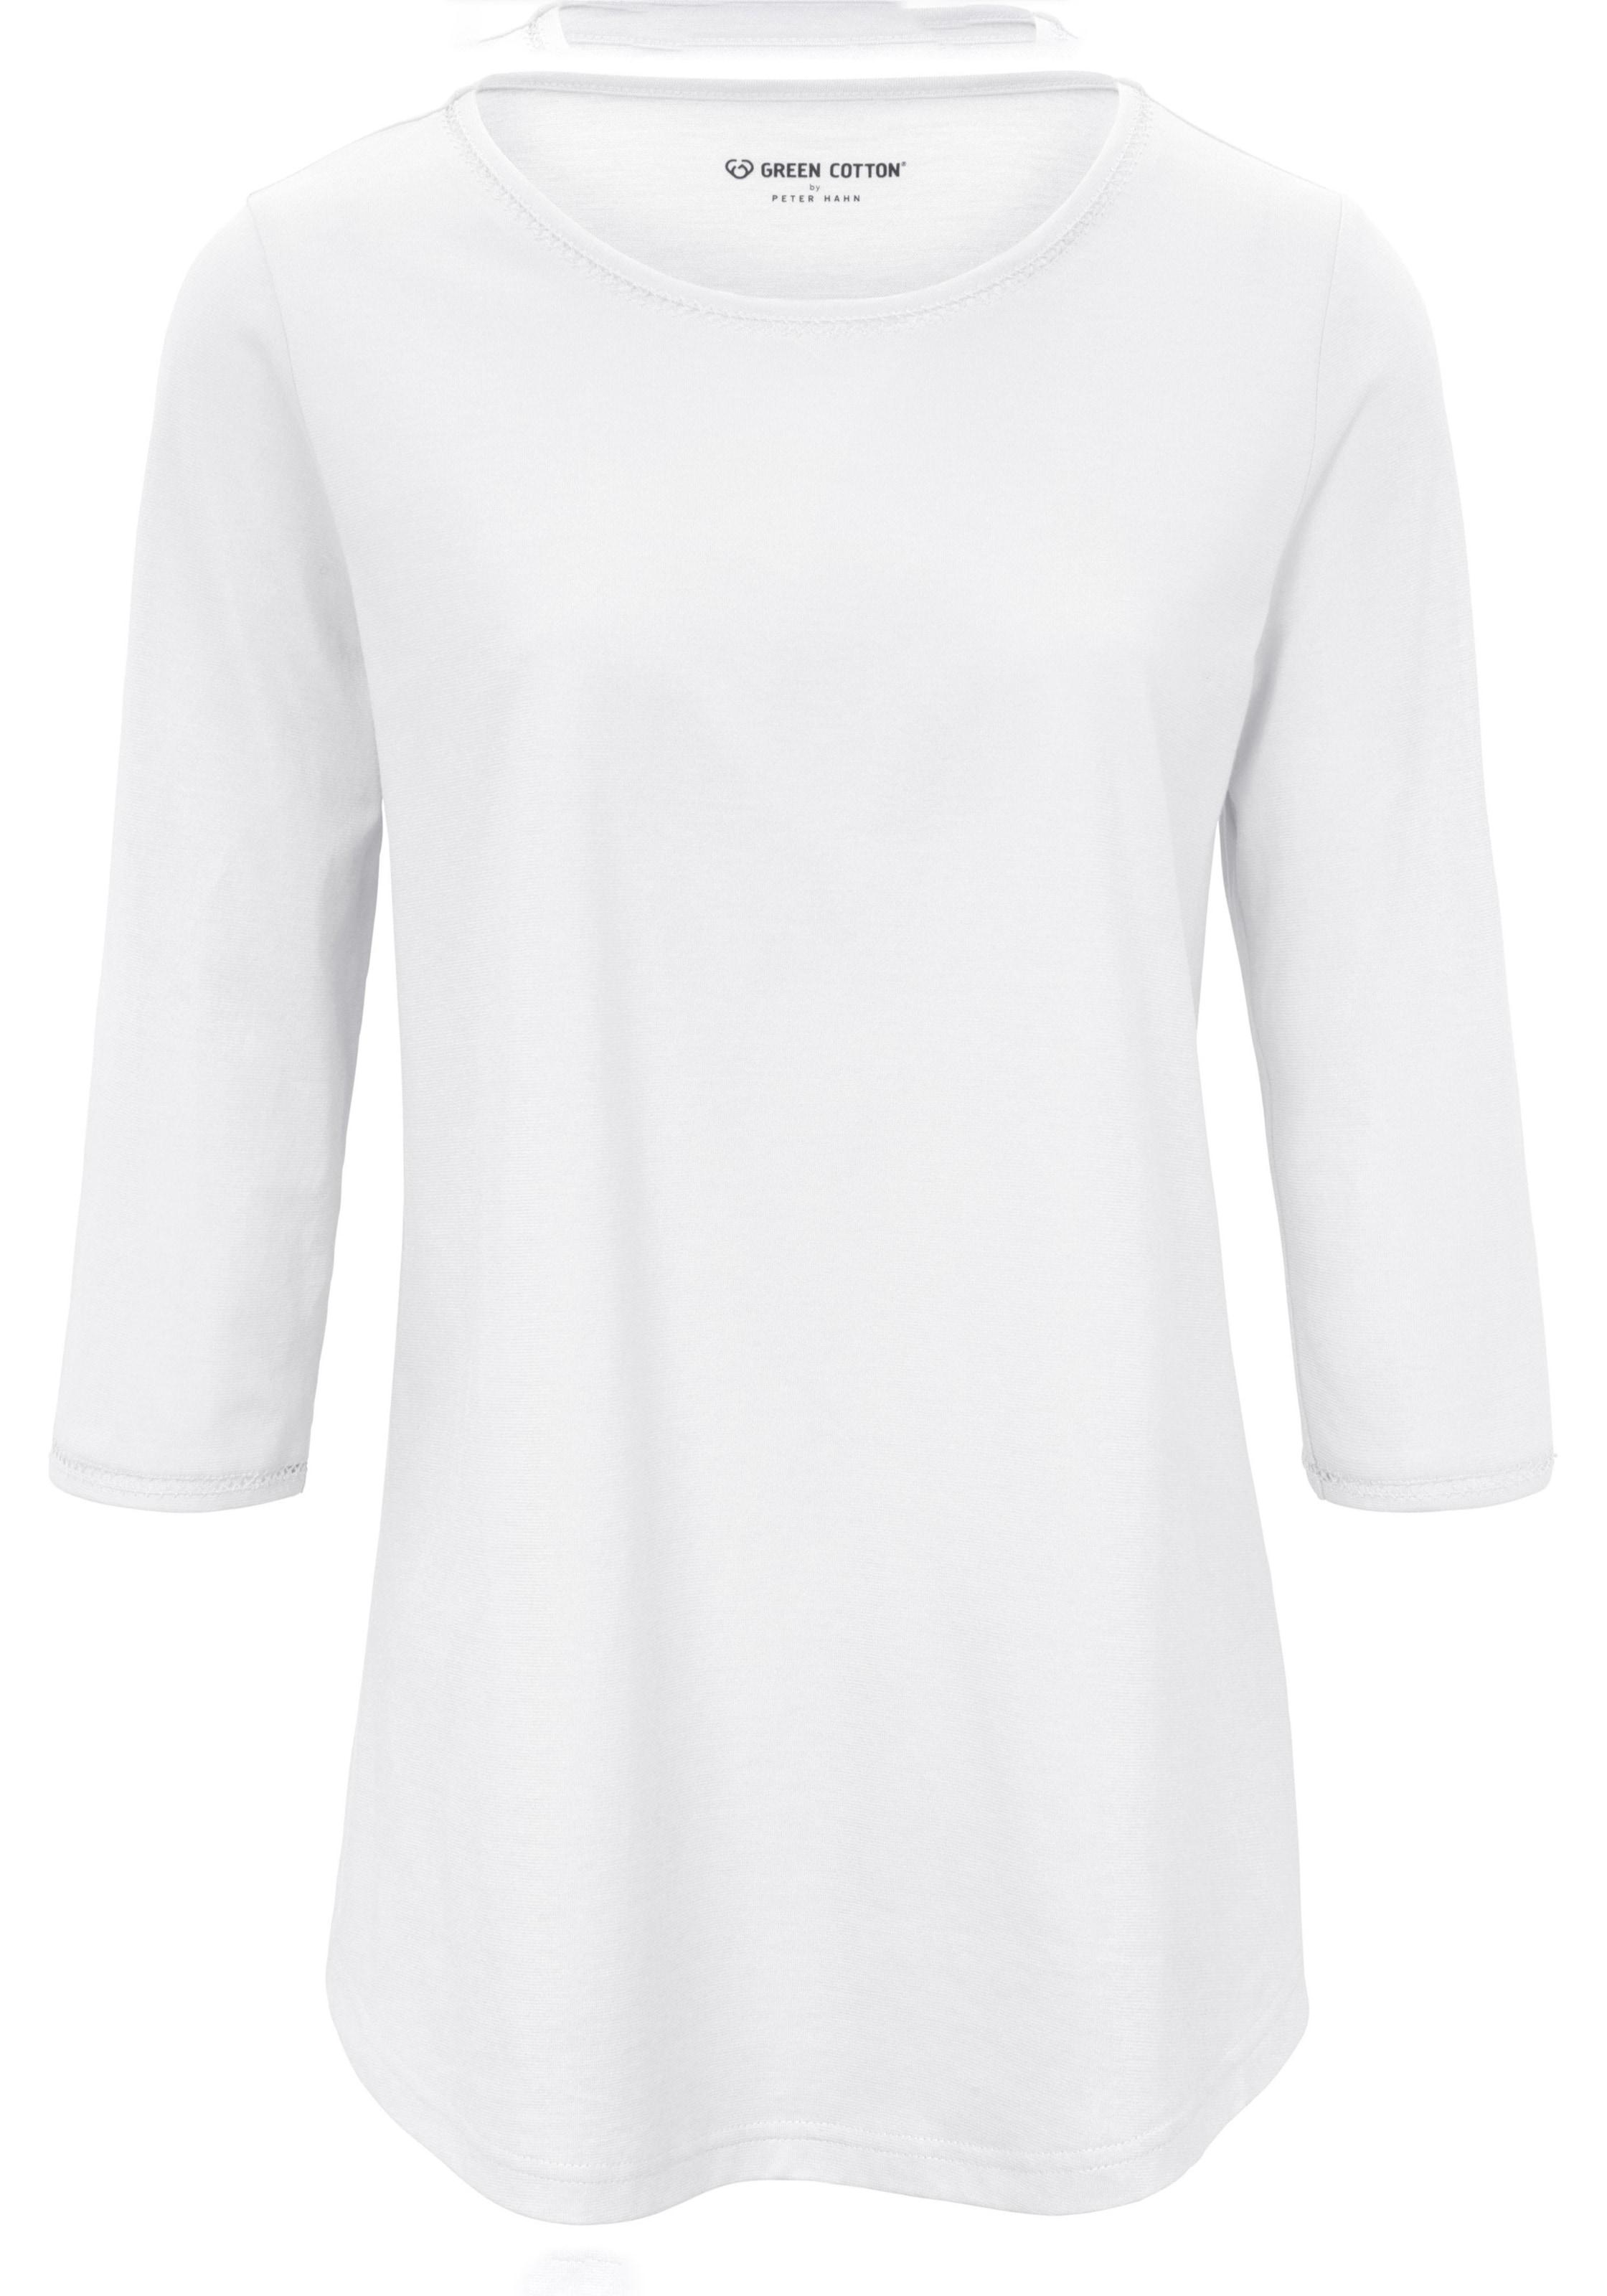 In Cotton Green Shirt Weiß Green 5lc3uJT1FK